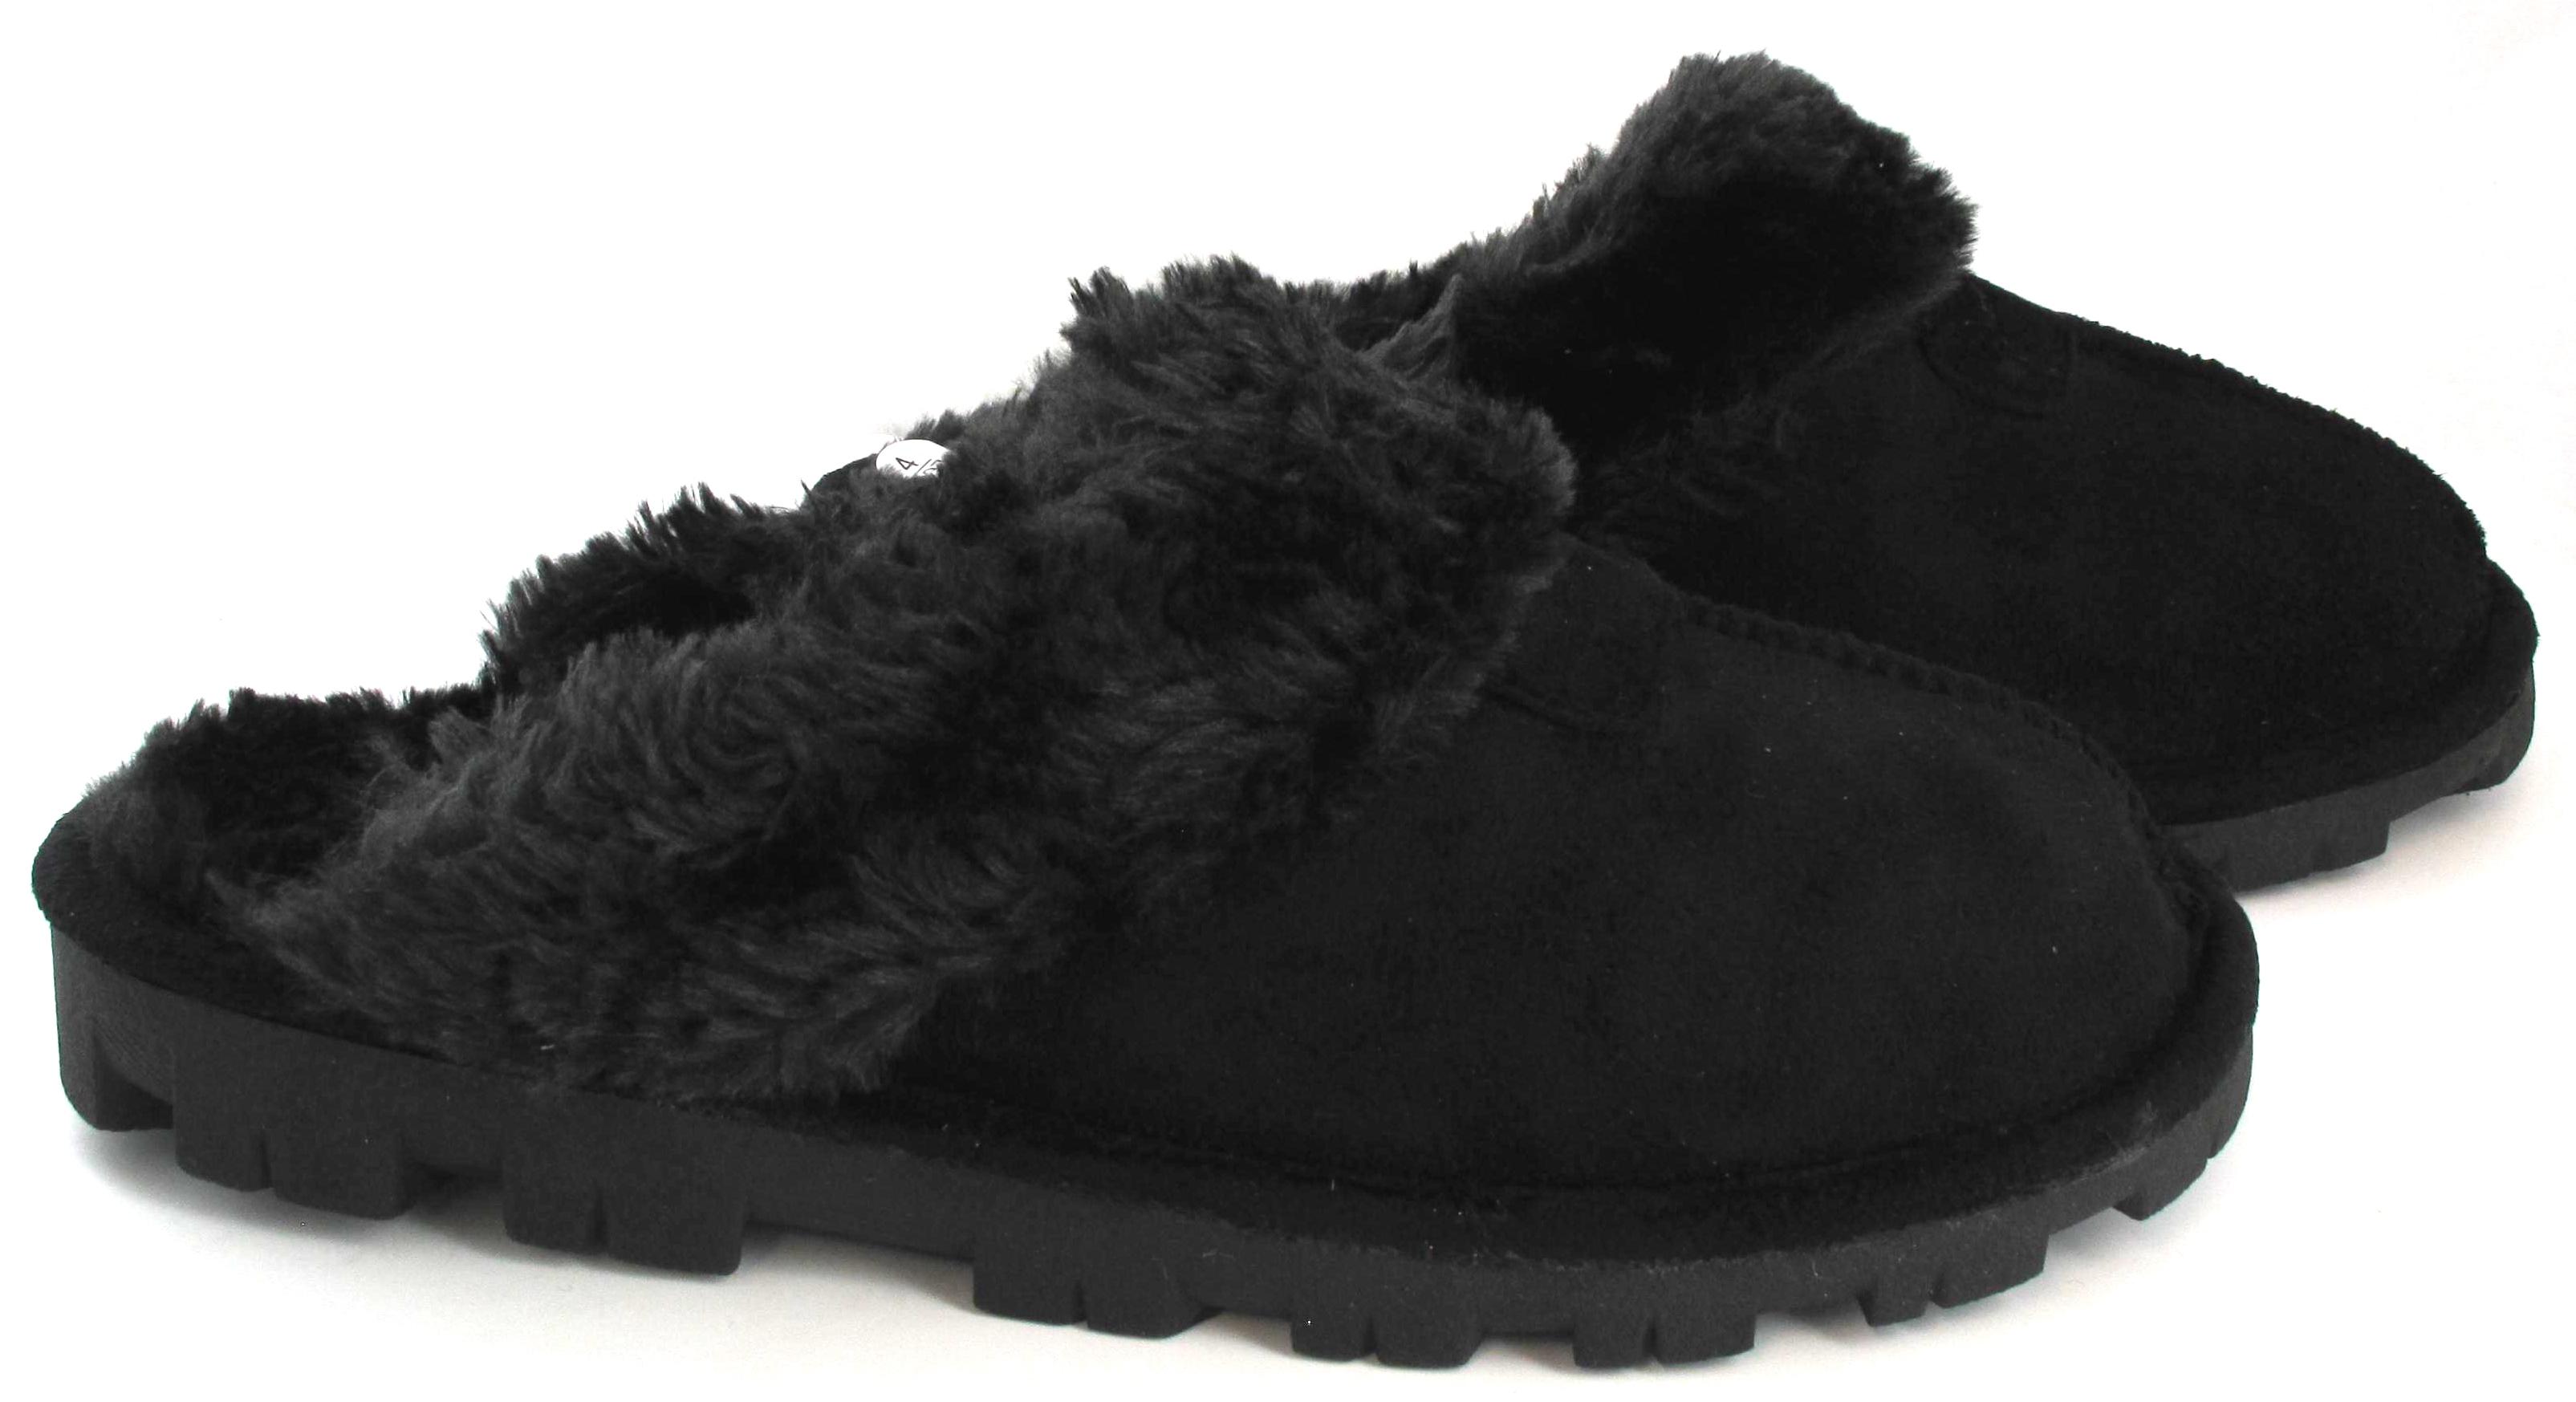 damen slipper warm pelz gef ttert winter bequem gummisohle hausschuhe 3 8 ebay. Black Bedroom Furniture Sets. Home Design Ideas